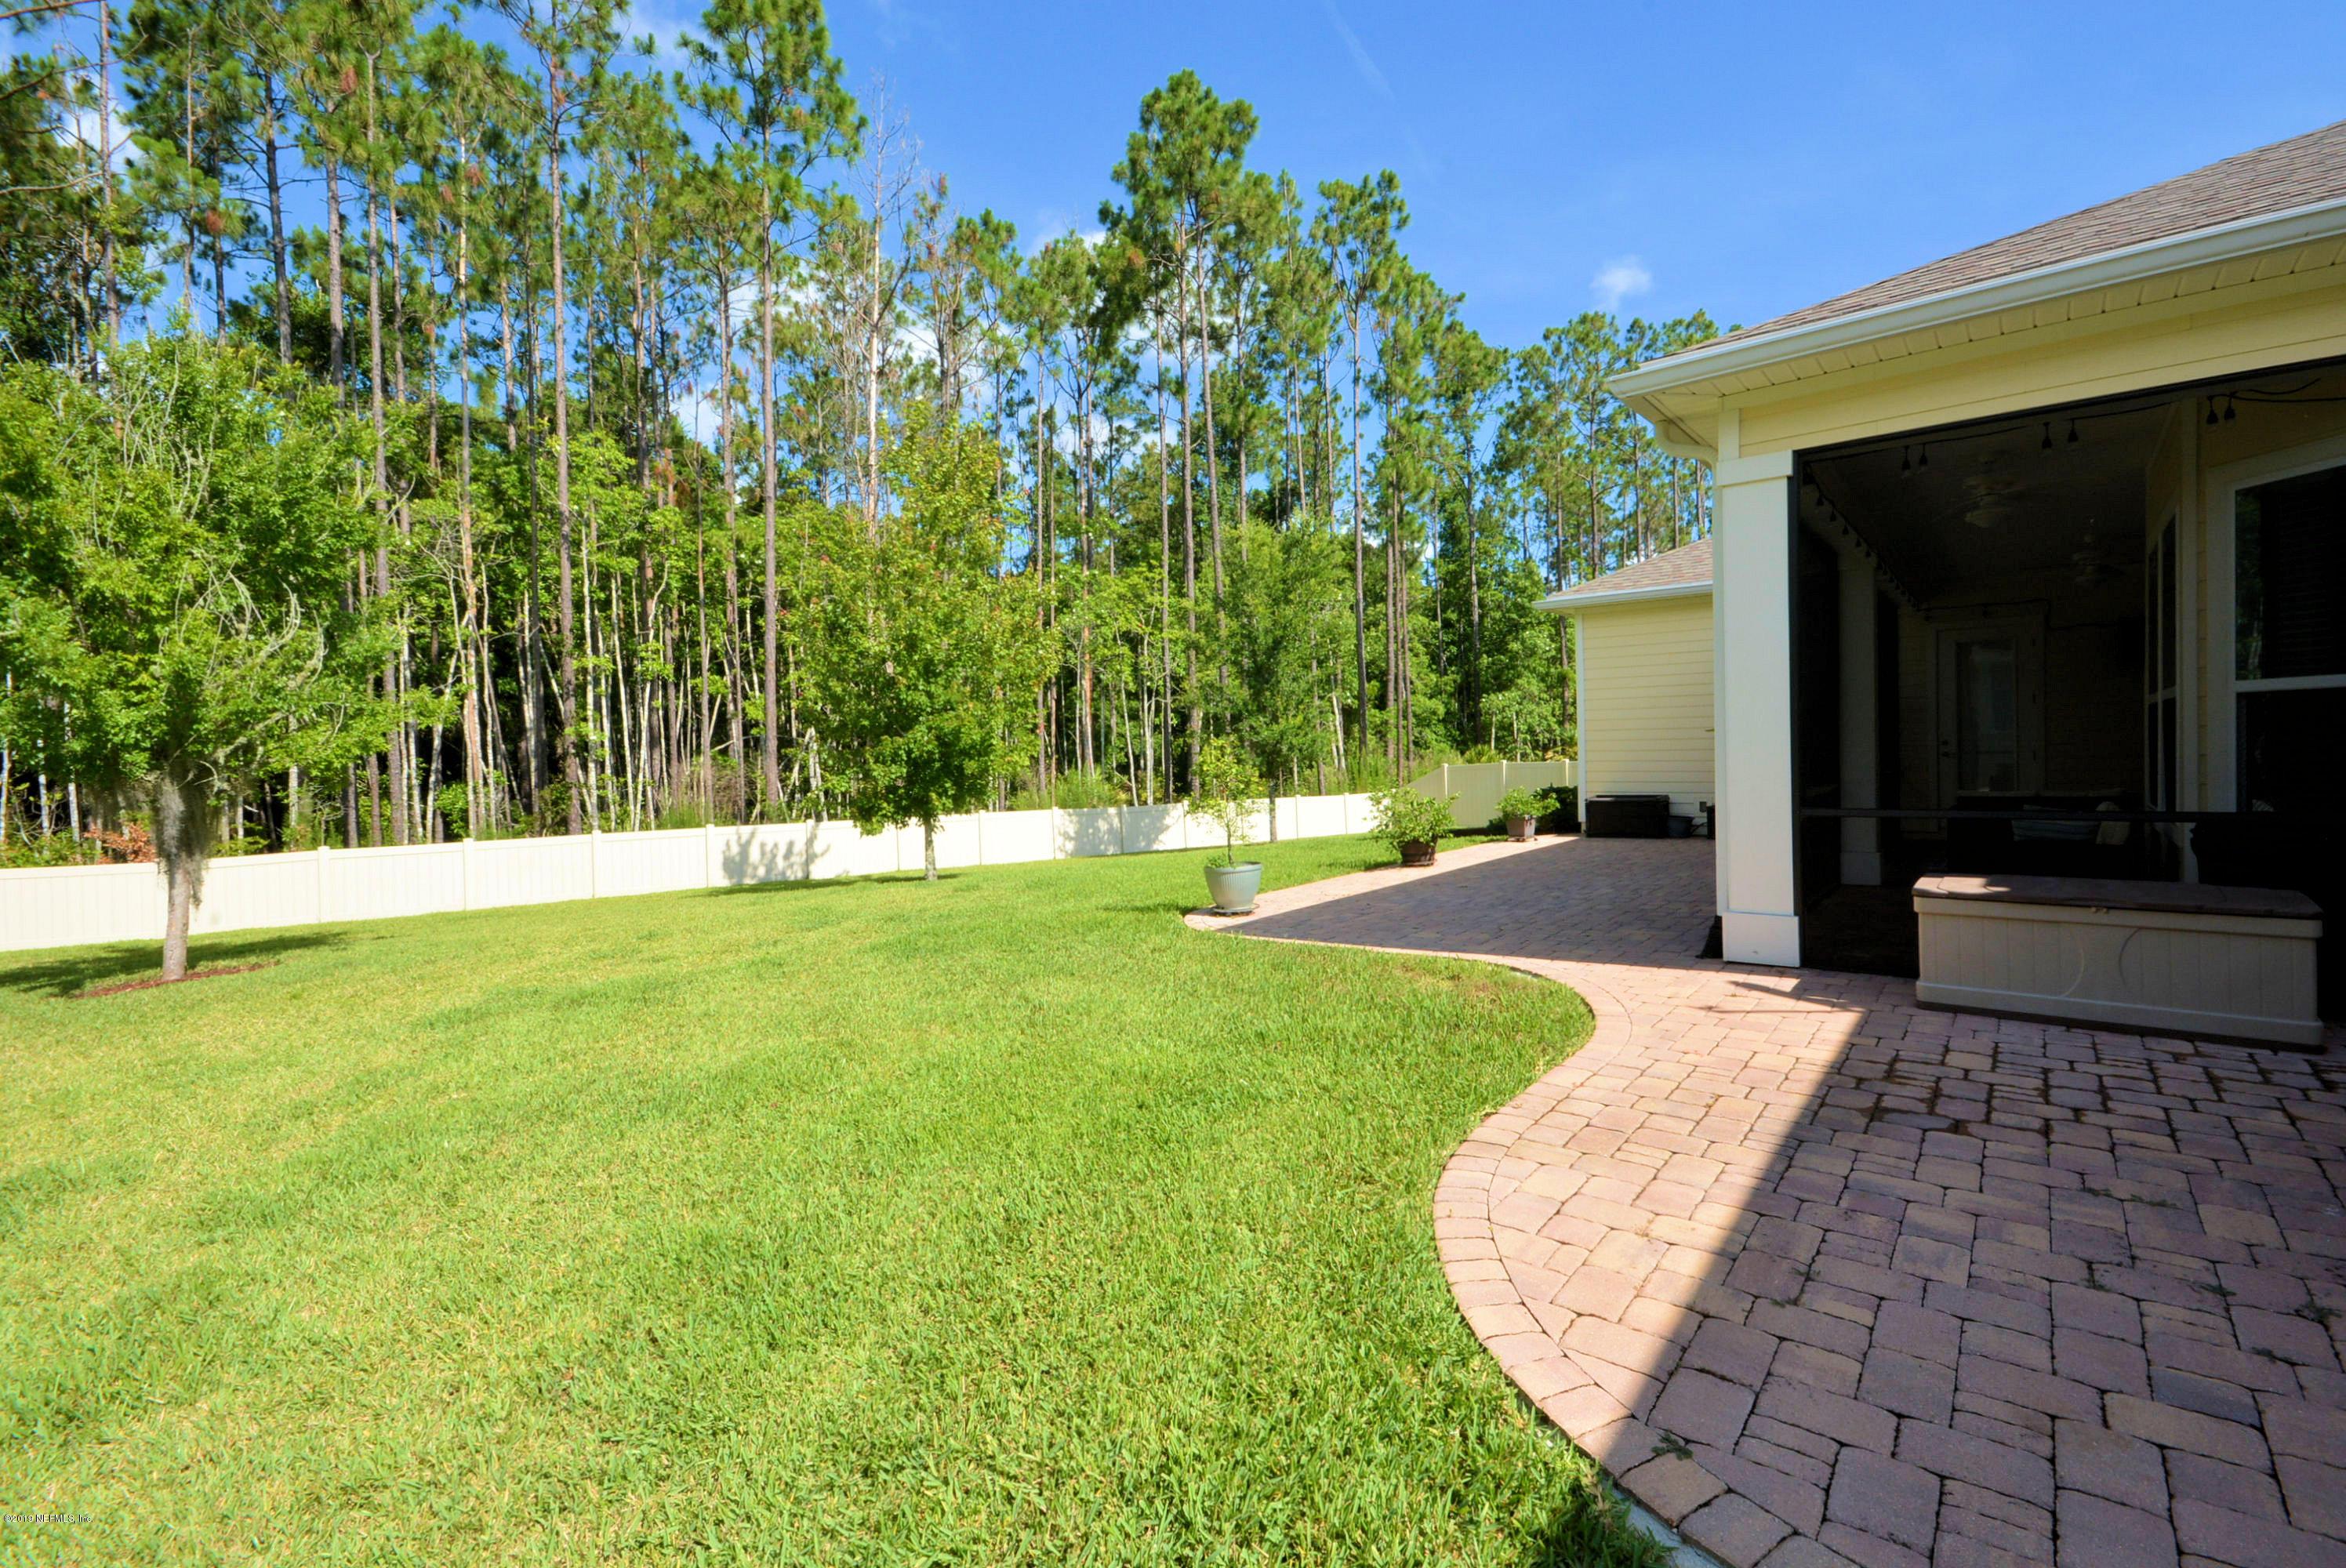 498 ENREDE, ST AUGUSTINE, FLORIDA 32095, 4 Bedrooms Bedrooms, ,4 BathroomsBathrooms,Residential - single family,For sale,ENREDE,1003021